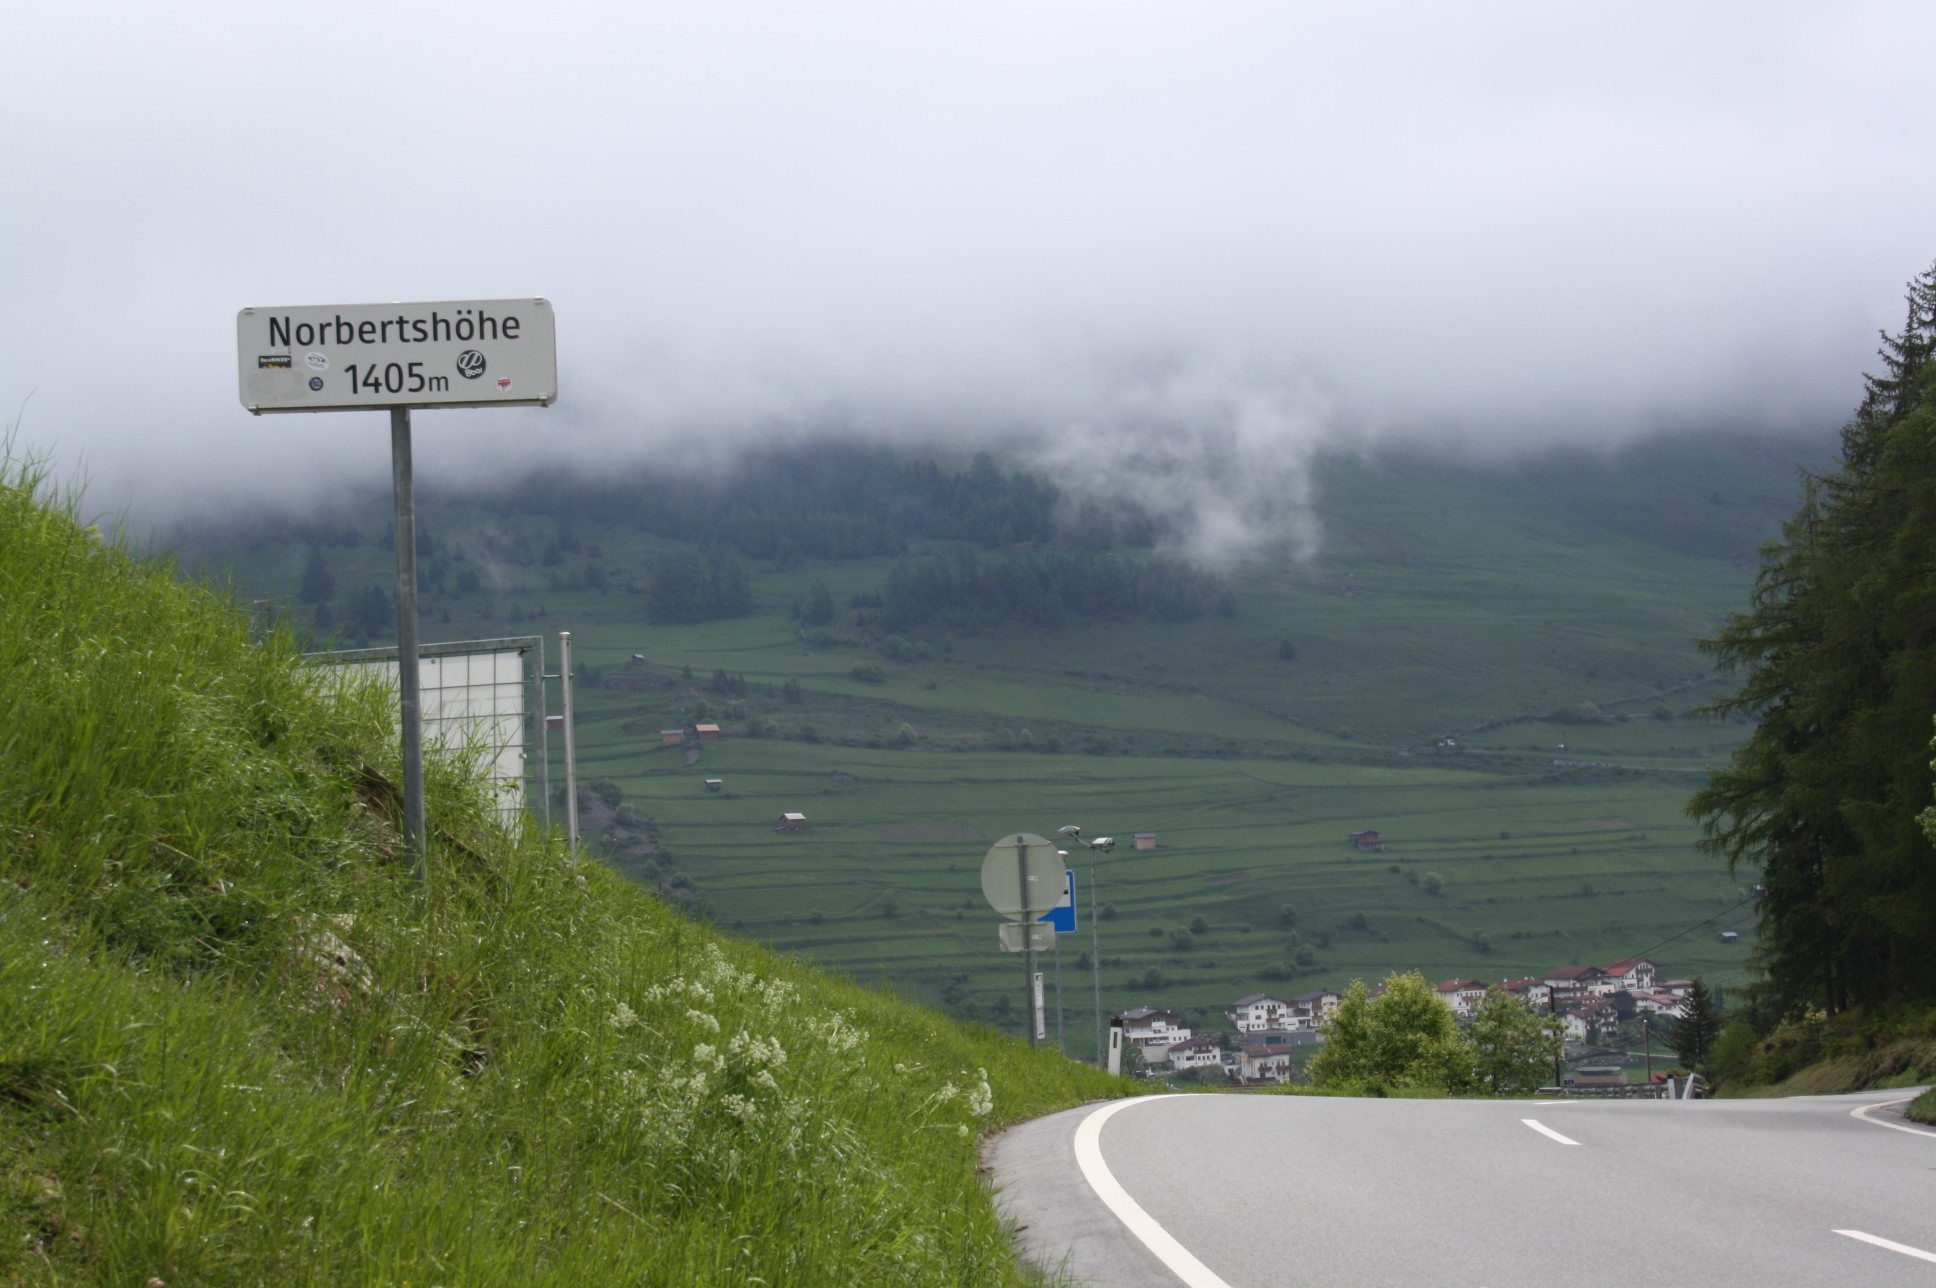 Passhöhe der Norbertshöhe